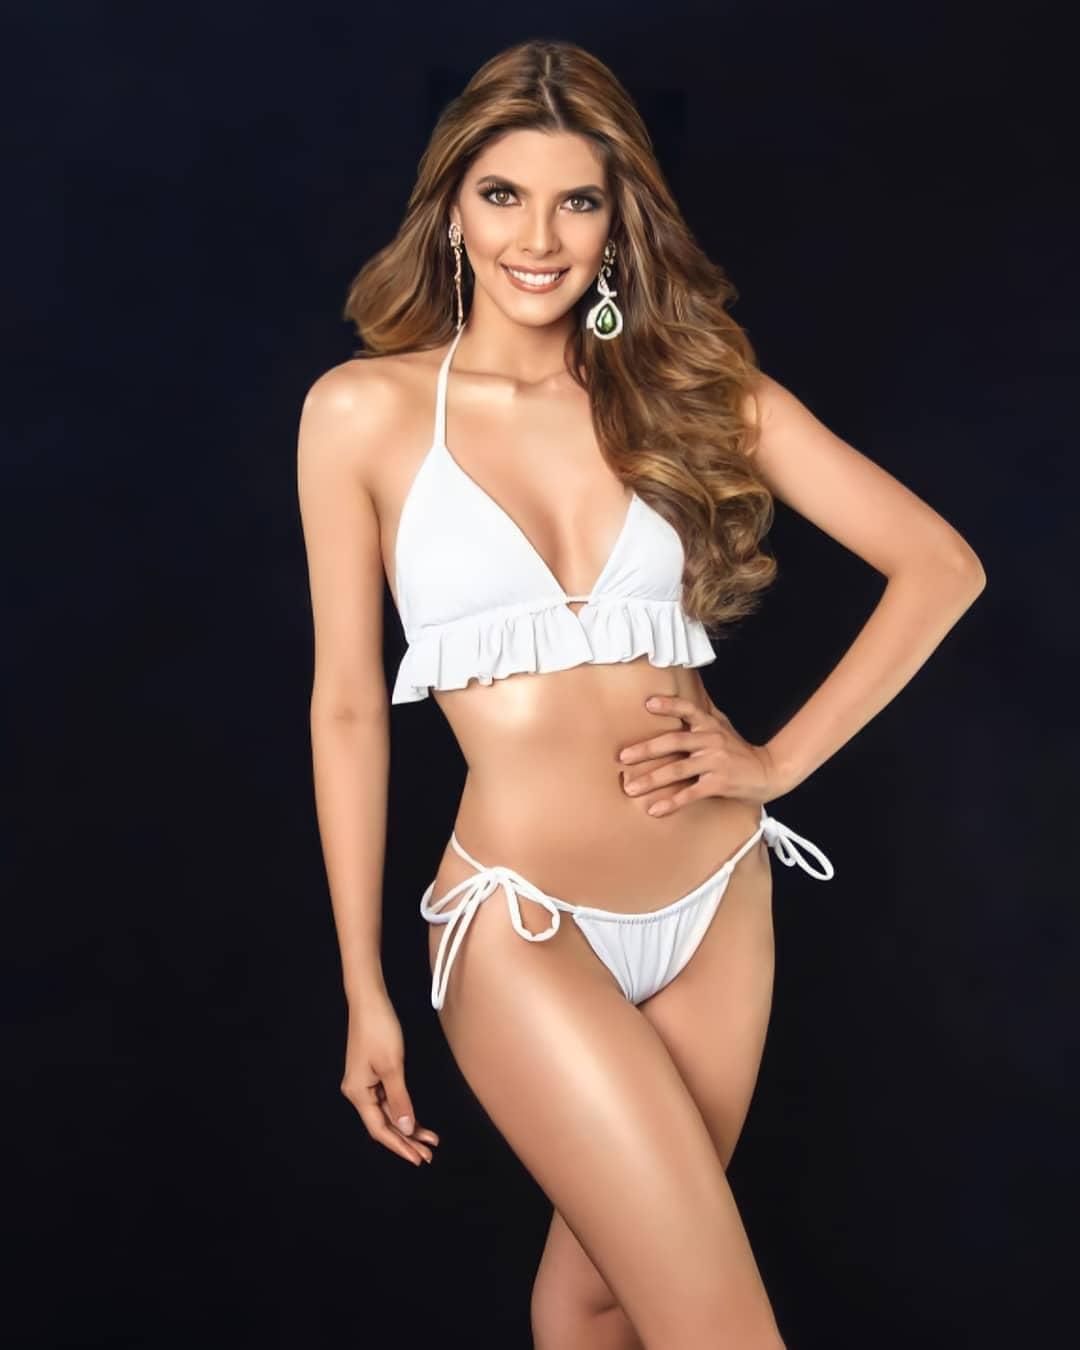 natalia manrique, miss grand colombia 2020. - Página 13 16419410